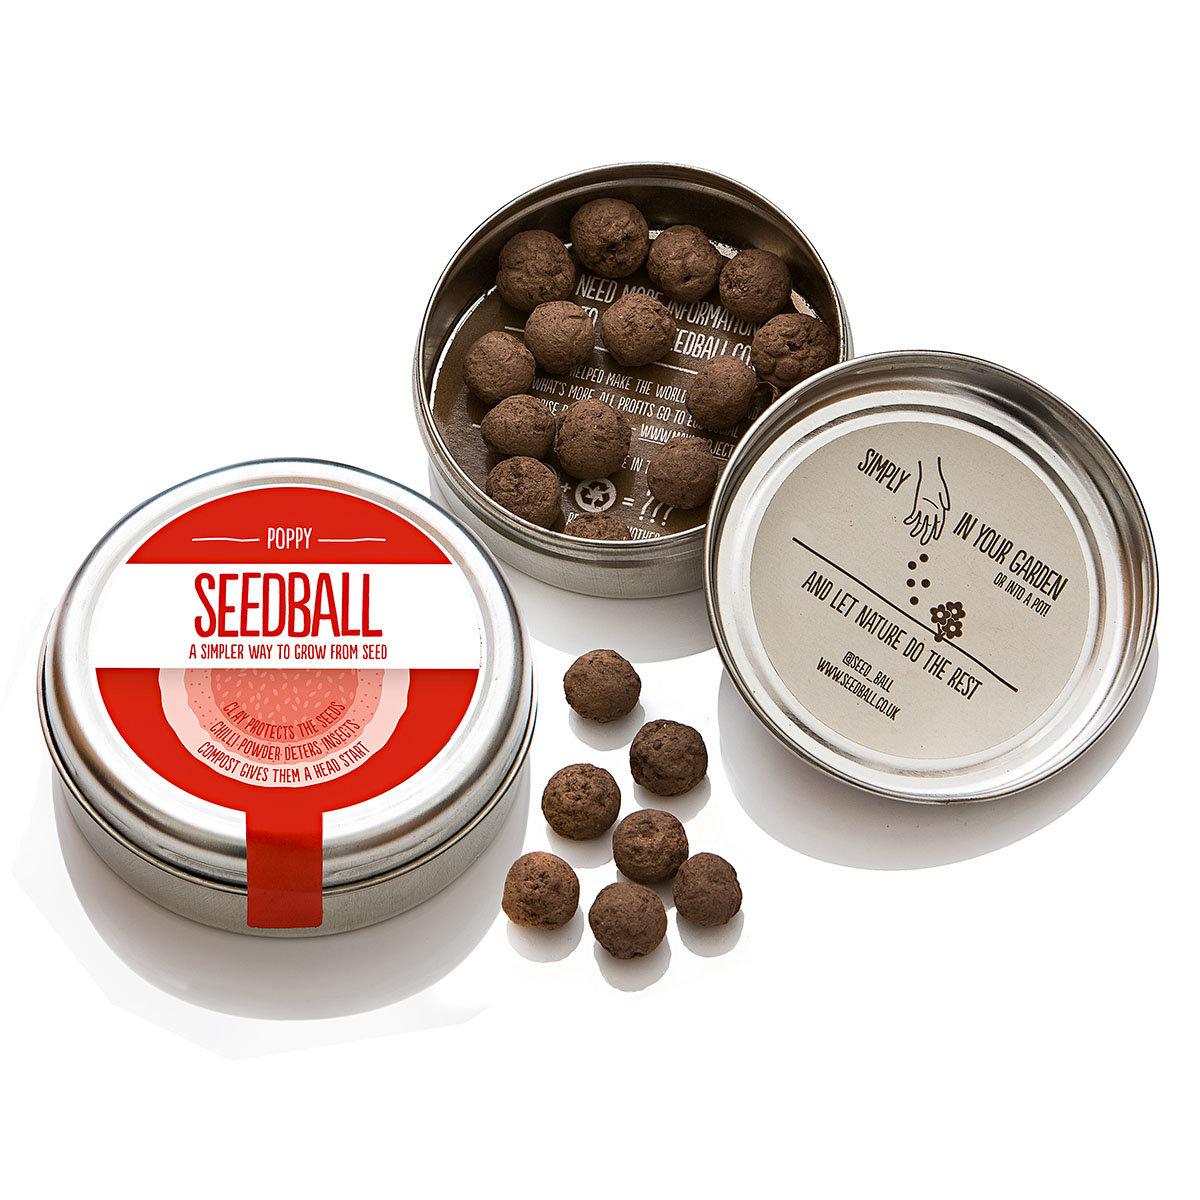 seedball mohn wiese 20 seedballs online kaufen bei g rtner p tschke. Black Bedroom Furniture Sets. Home Design Ideas